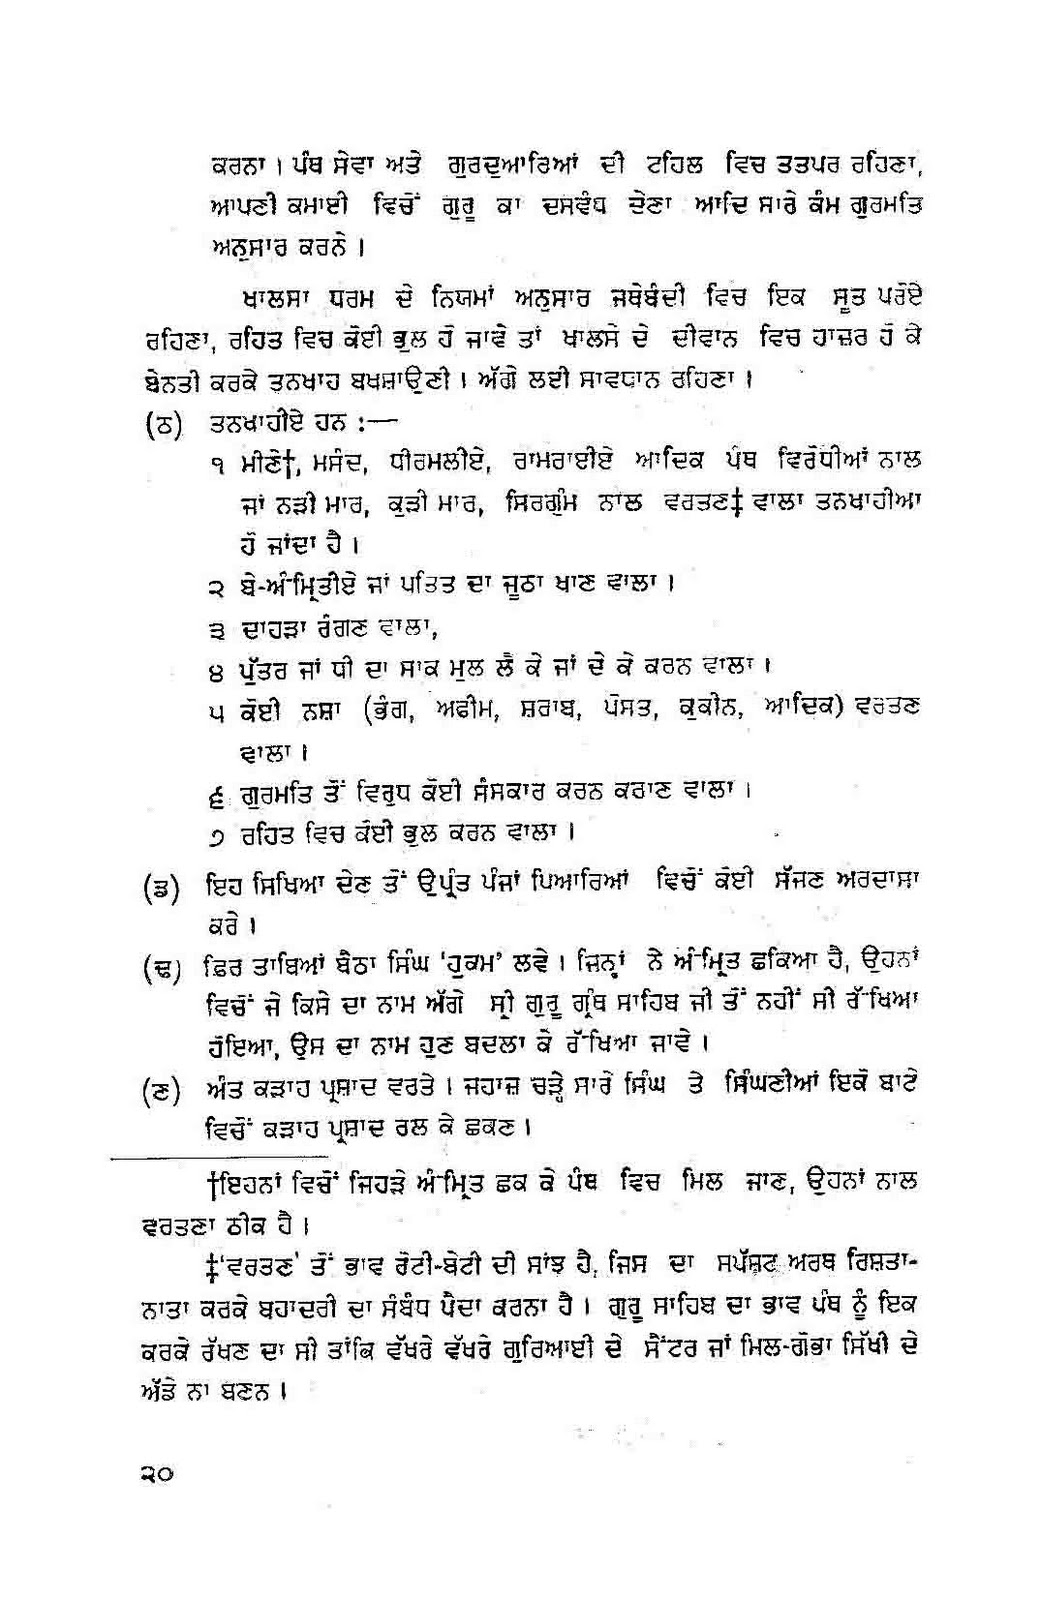 sikh rehat maryada Singh sabha london east defies sikh rehat maryada by allowing hindu ritual in  darbar hall by sikh24 editors - february 4, 2017.